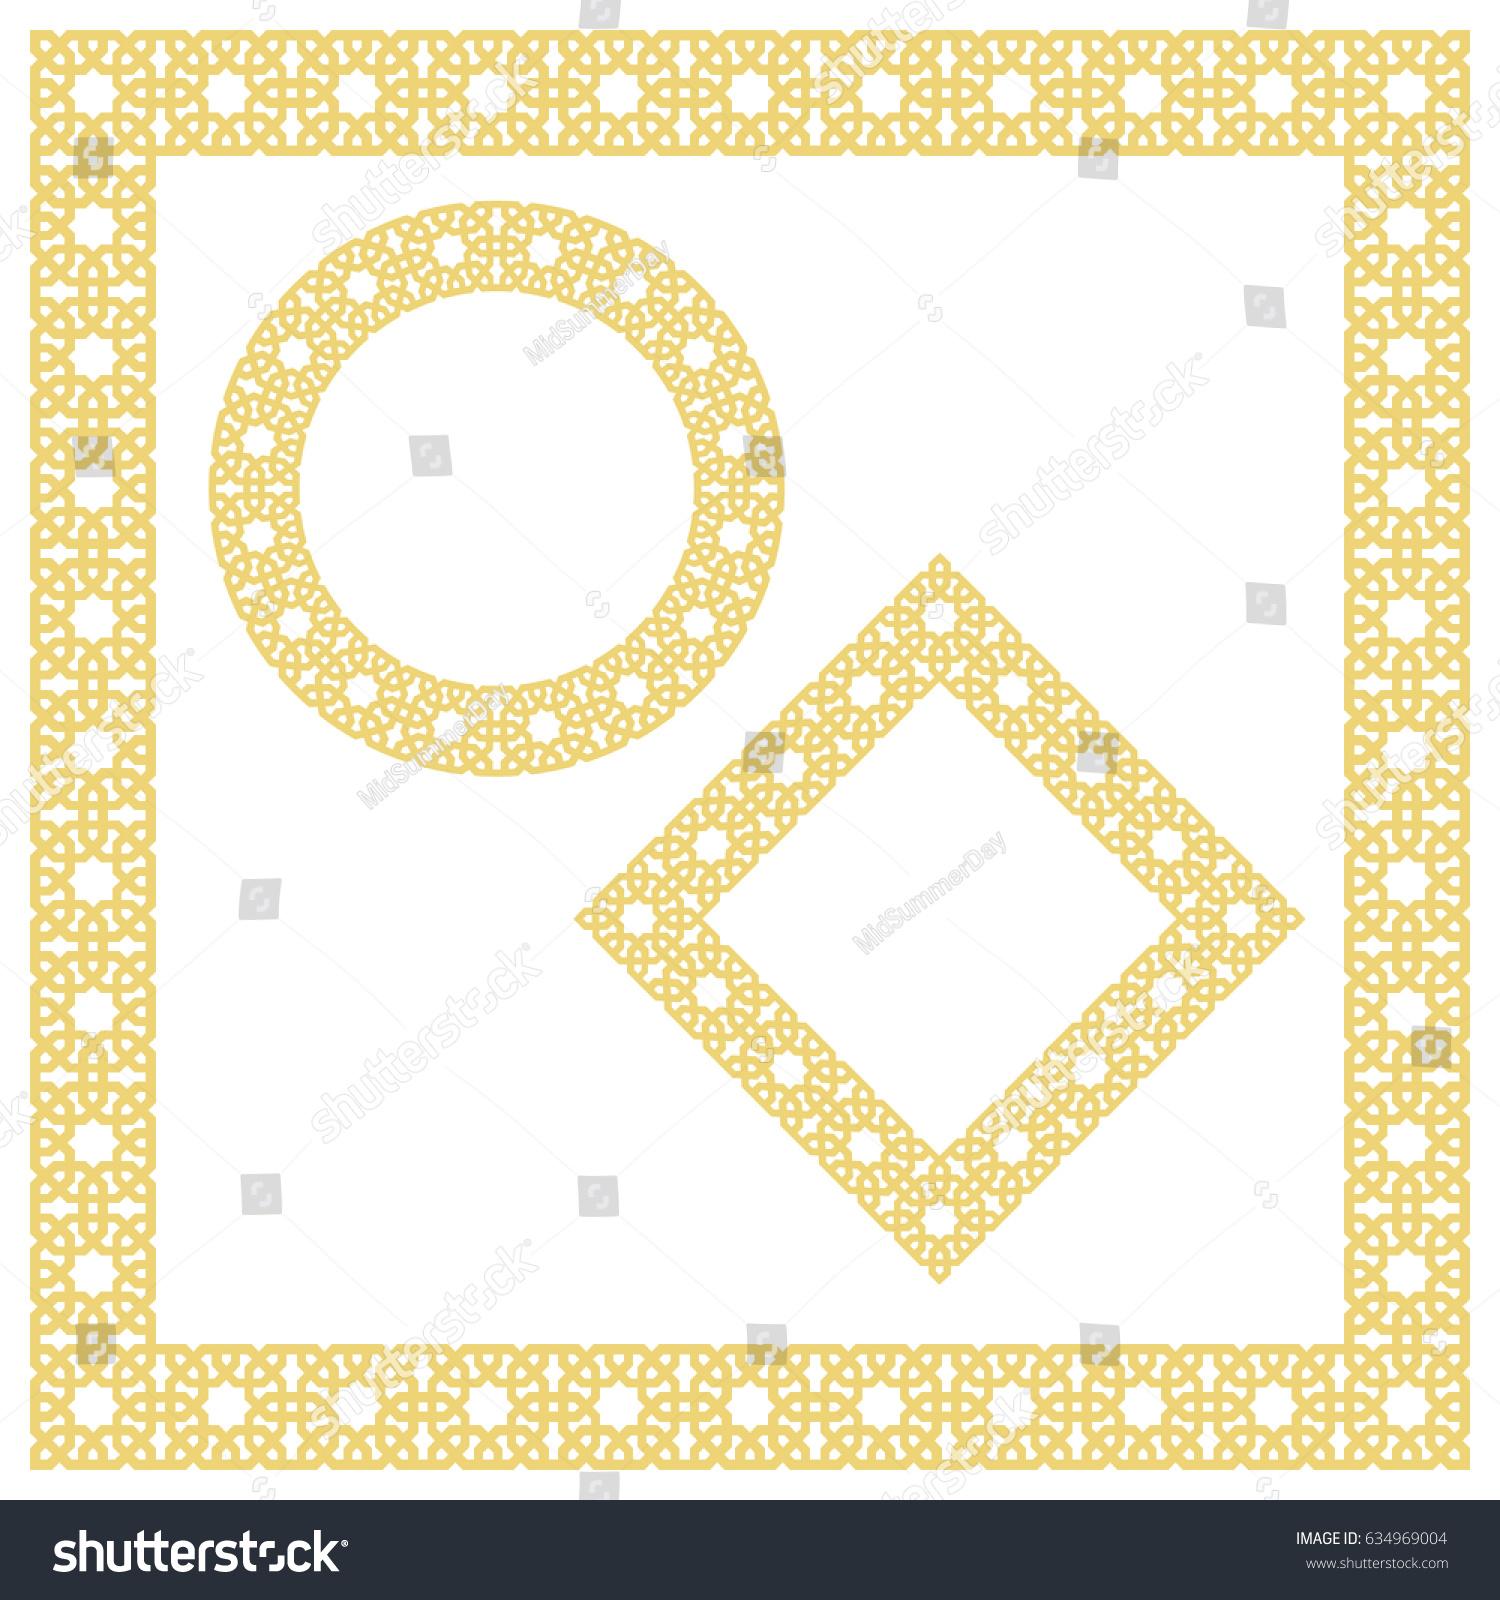 Islamic Geometric Borders Frames Vignettes Vector Stock Vector ...